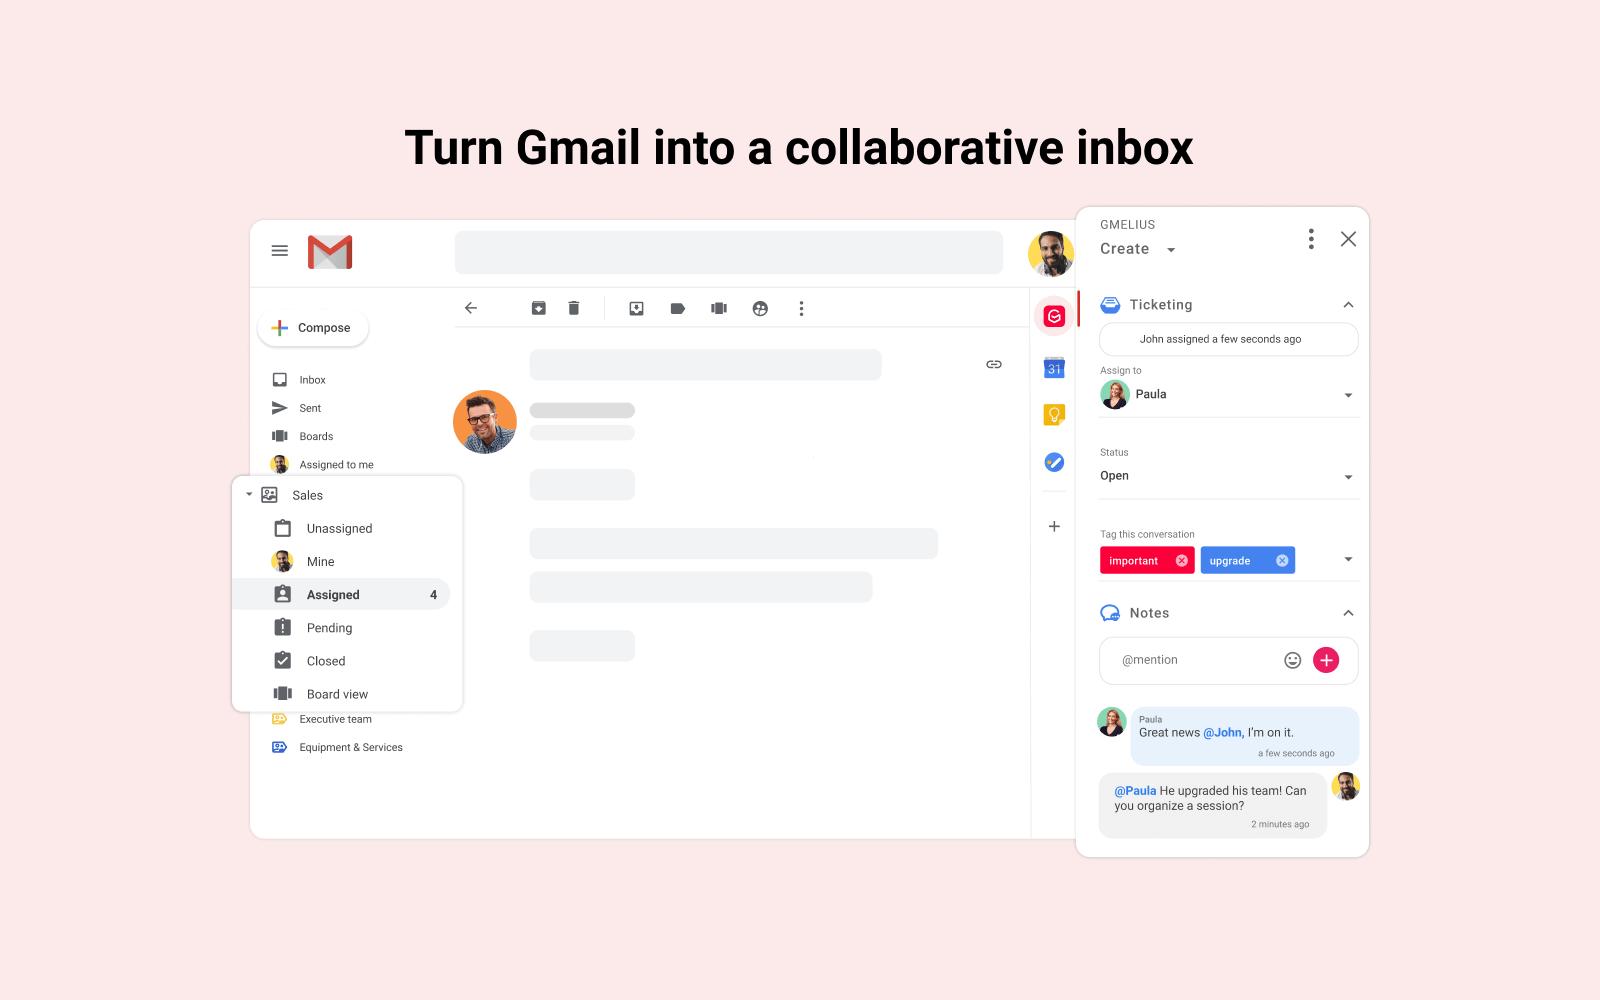 Transform Gmail into a collaborative inbox